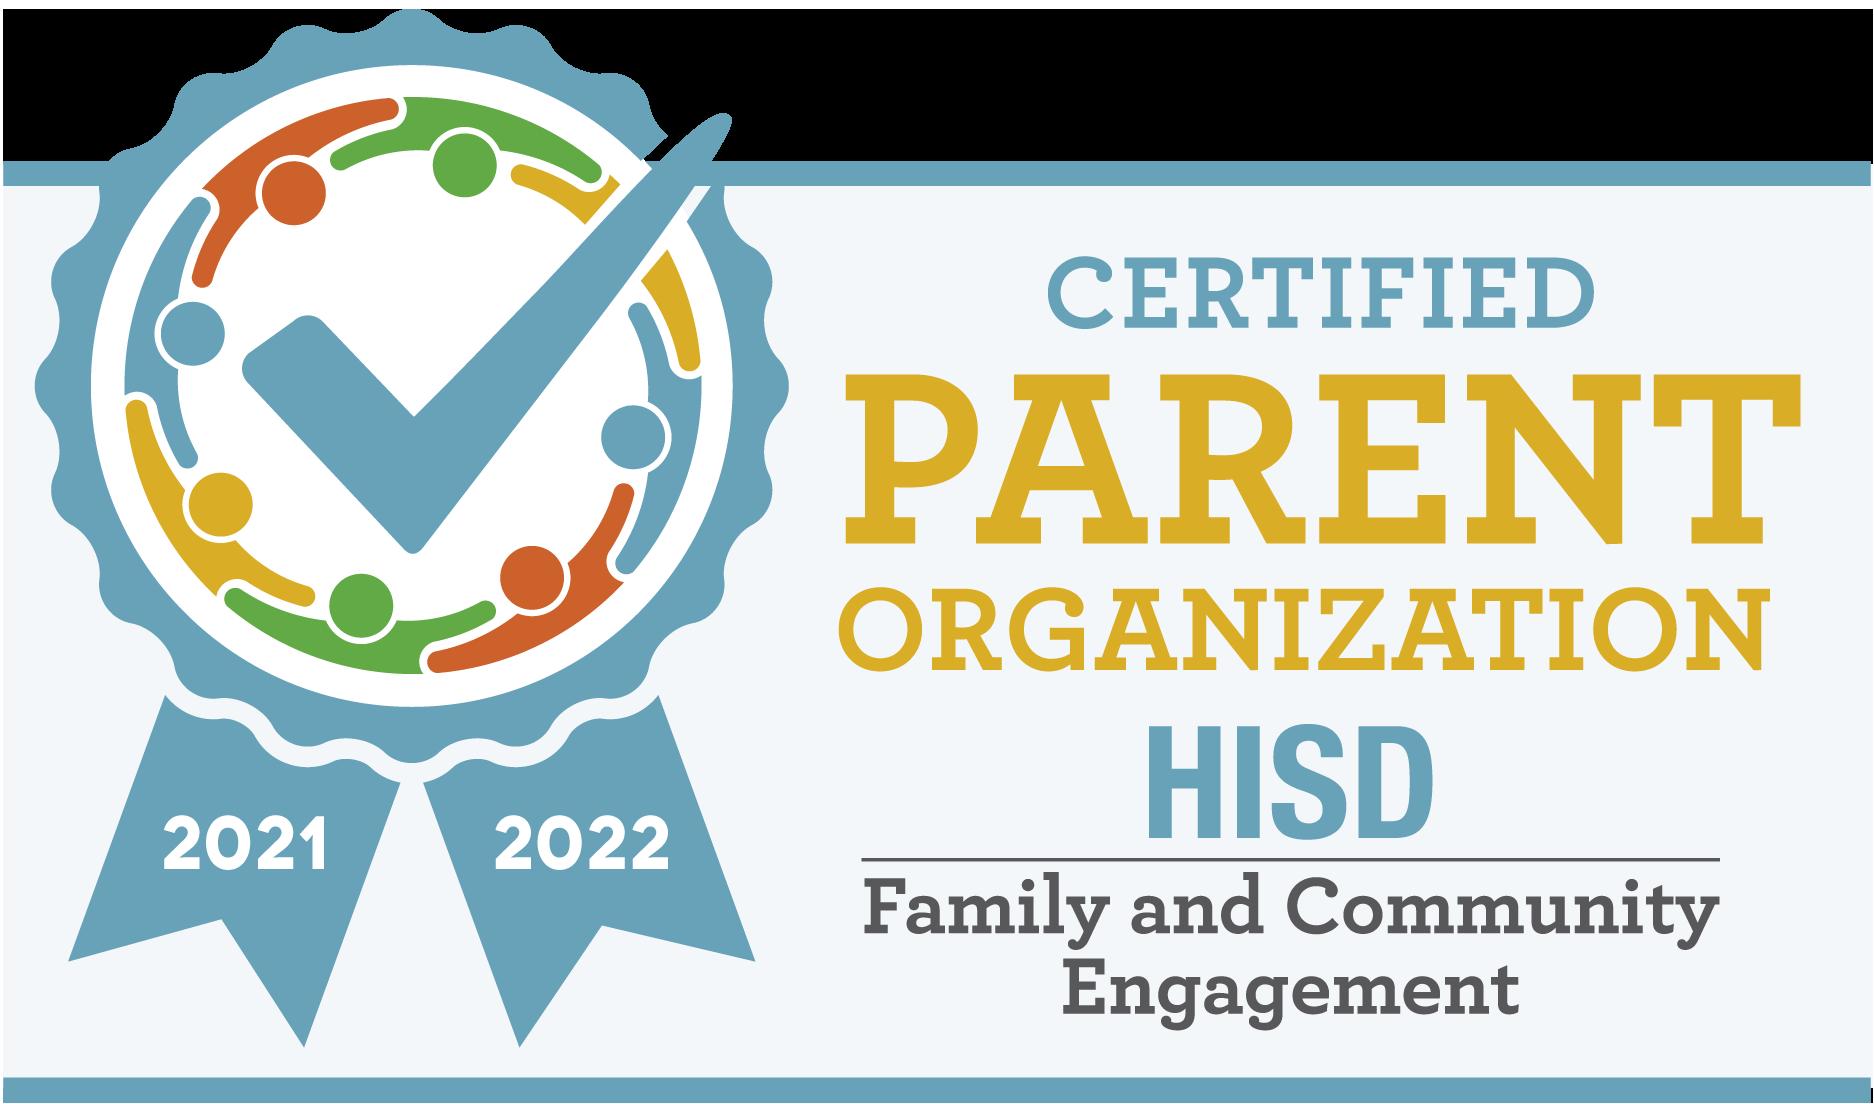 Certified Parent Organization